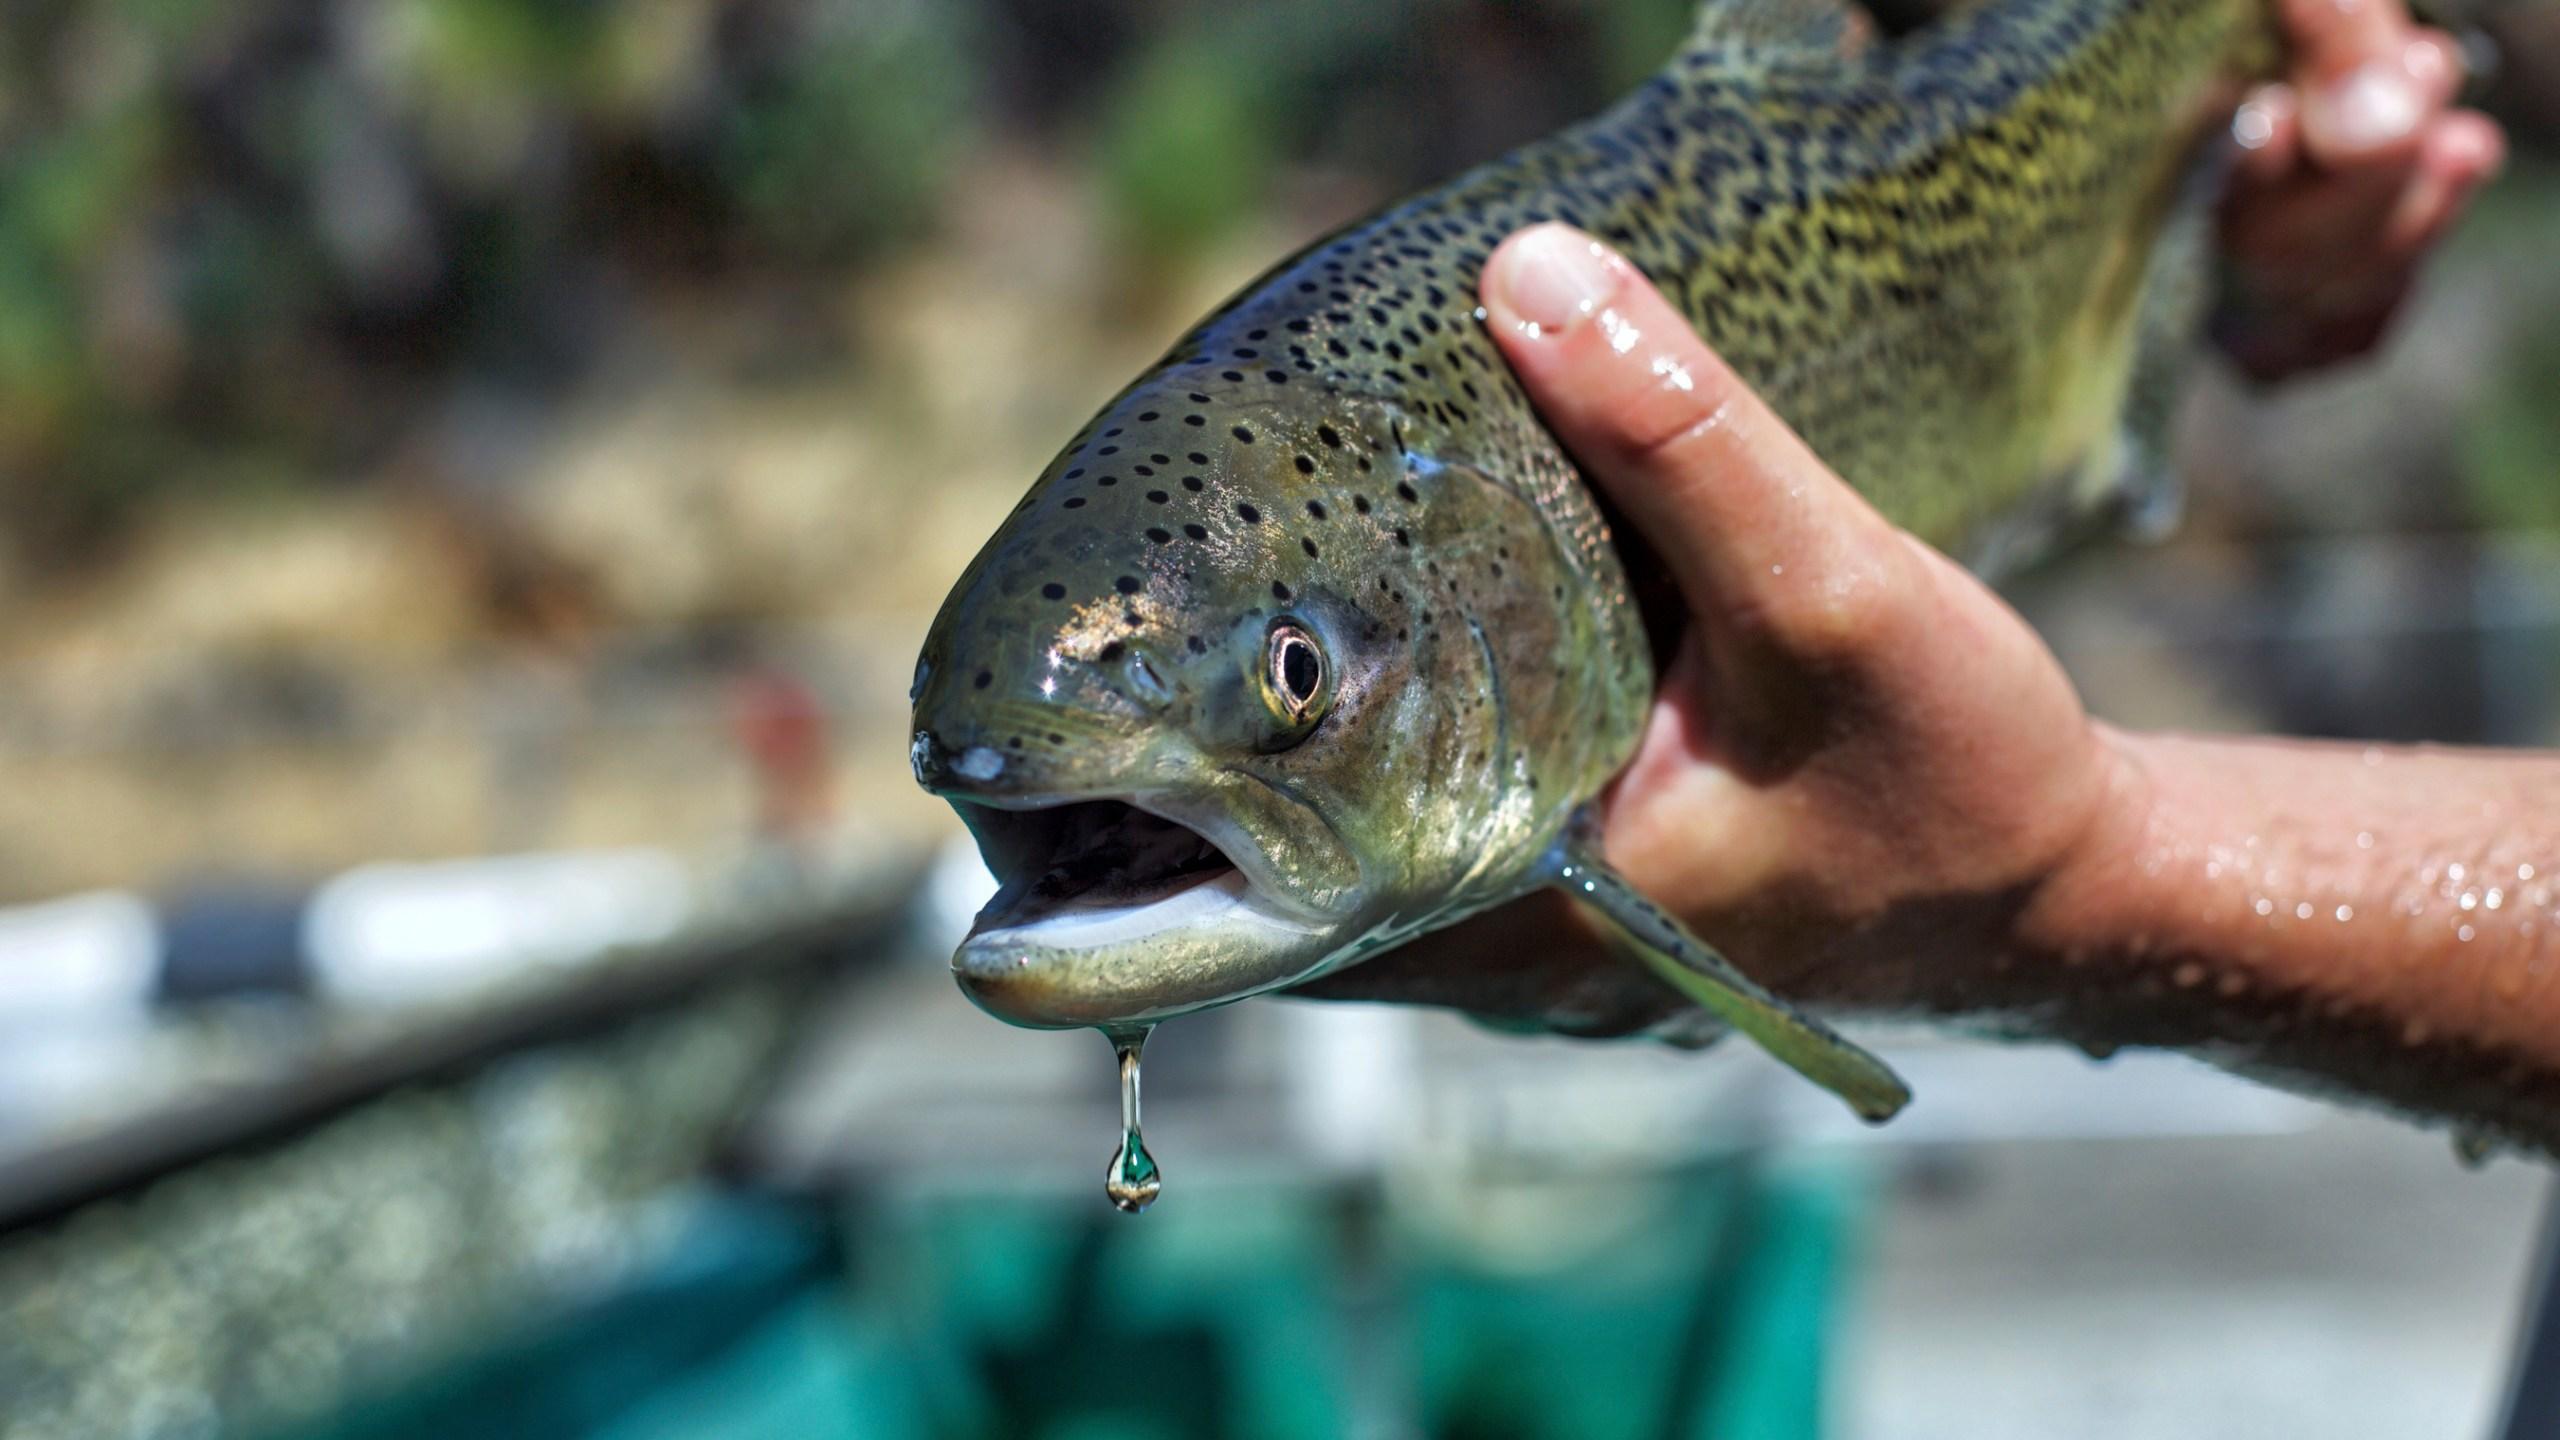 California_Salmon_Dams_27800-159532.jpg12536696